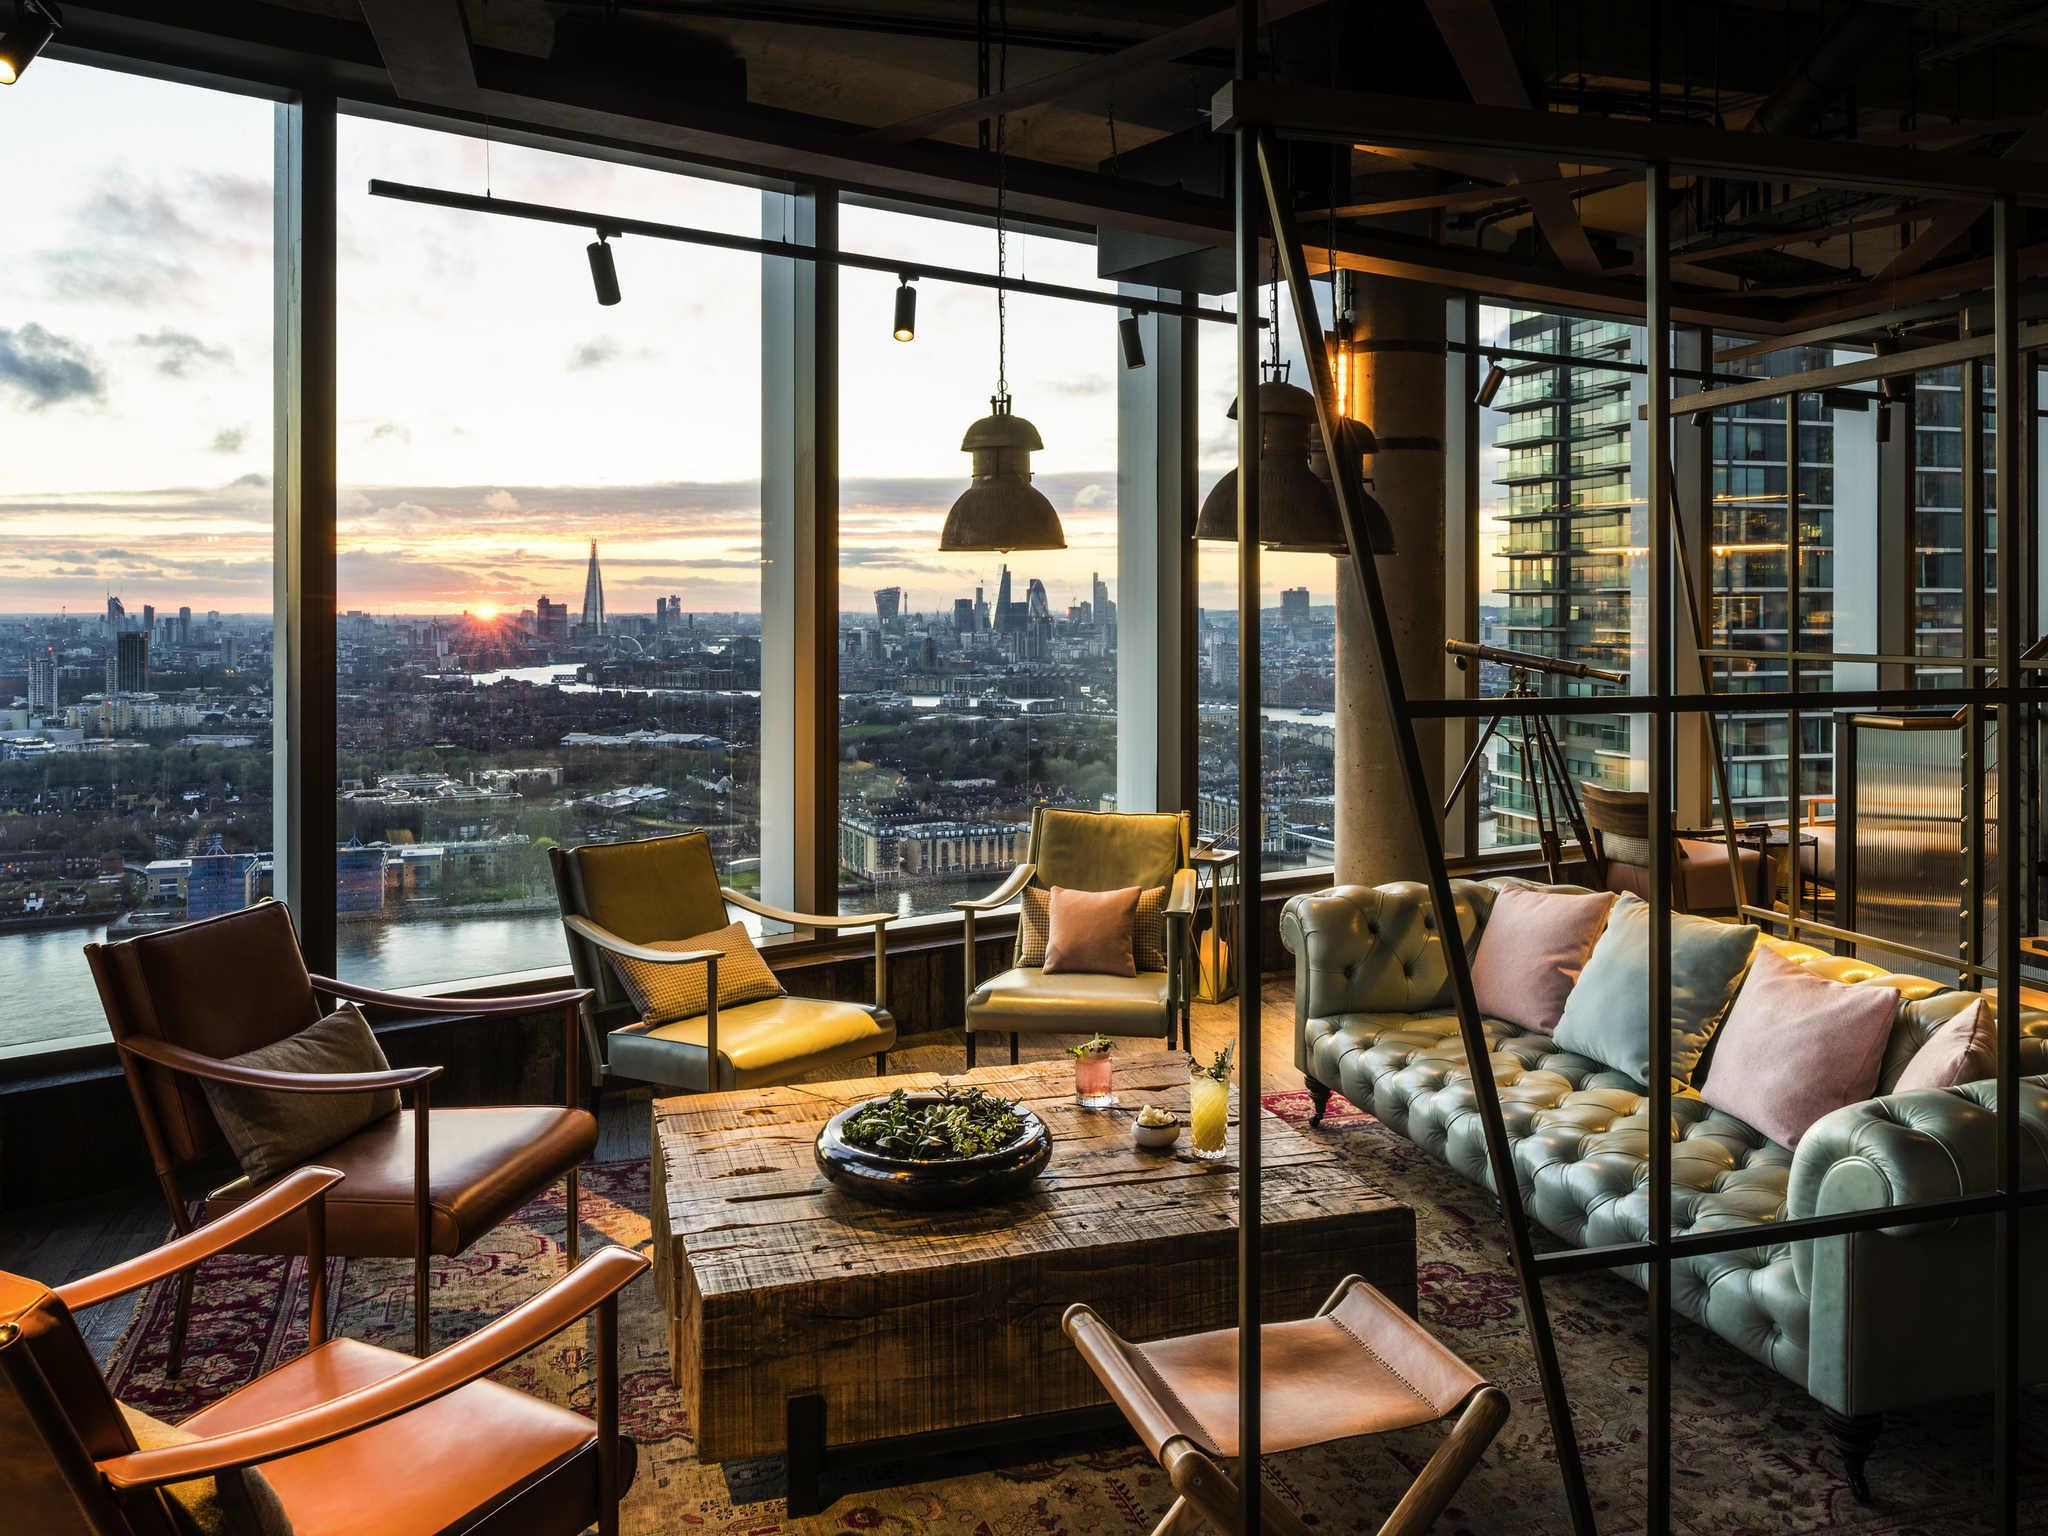 Hotel – Novotel London Canary Wharf